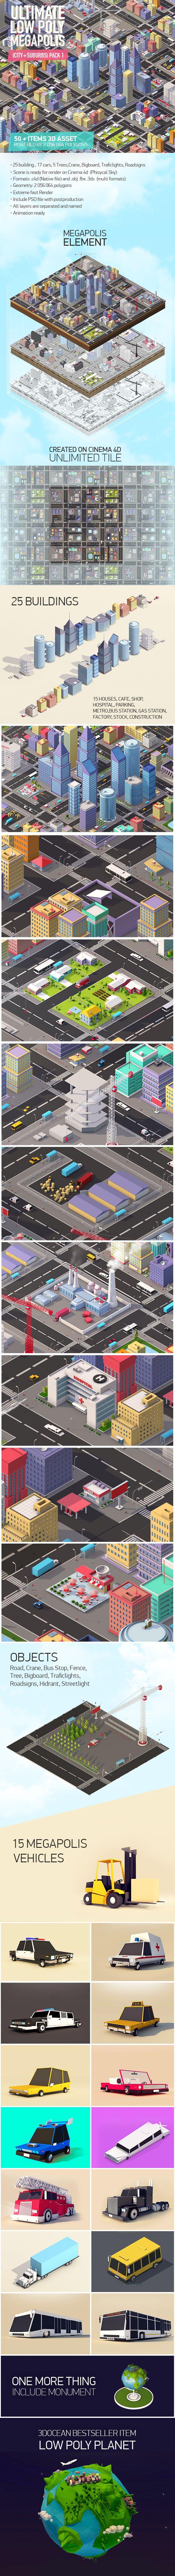 Ultimate Low Poly Megapolis (City + Suburbs) Pack 1 3D Models Design Template #cinema4d #3D #3dDesign Download here: https://3docean.net/item/ultimate-low-poly-megapolis-city-suburbs-pack-1/16882227?ref=yinkira